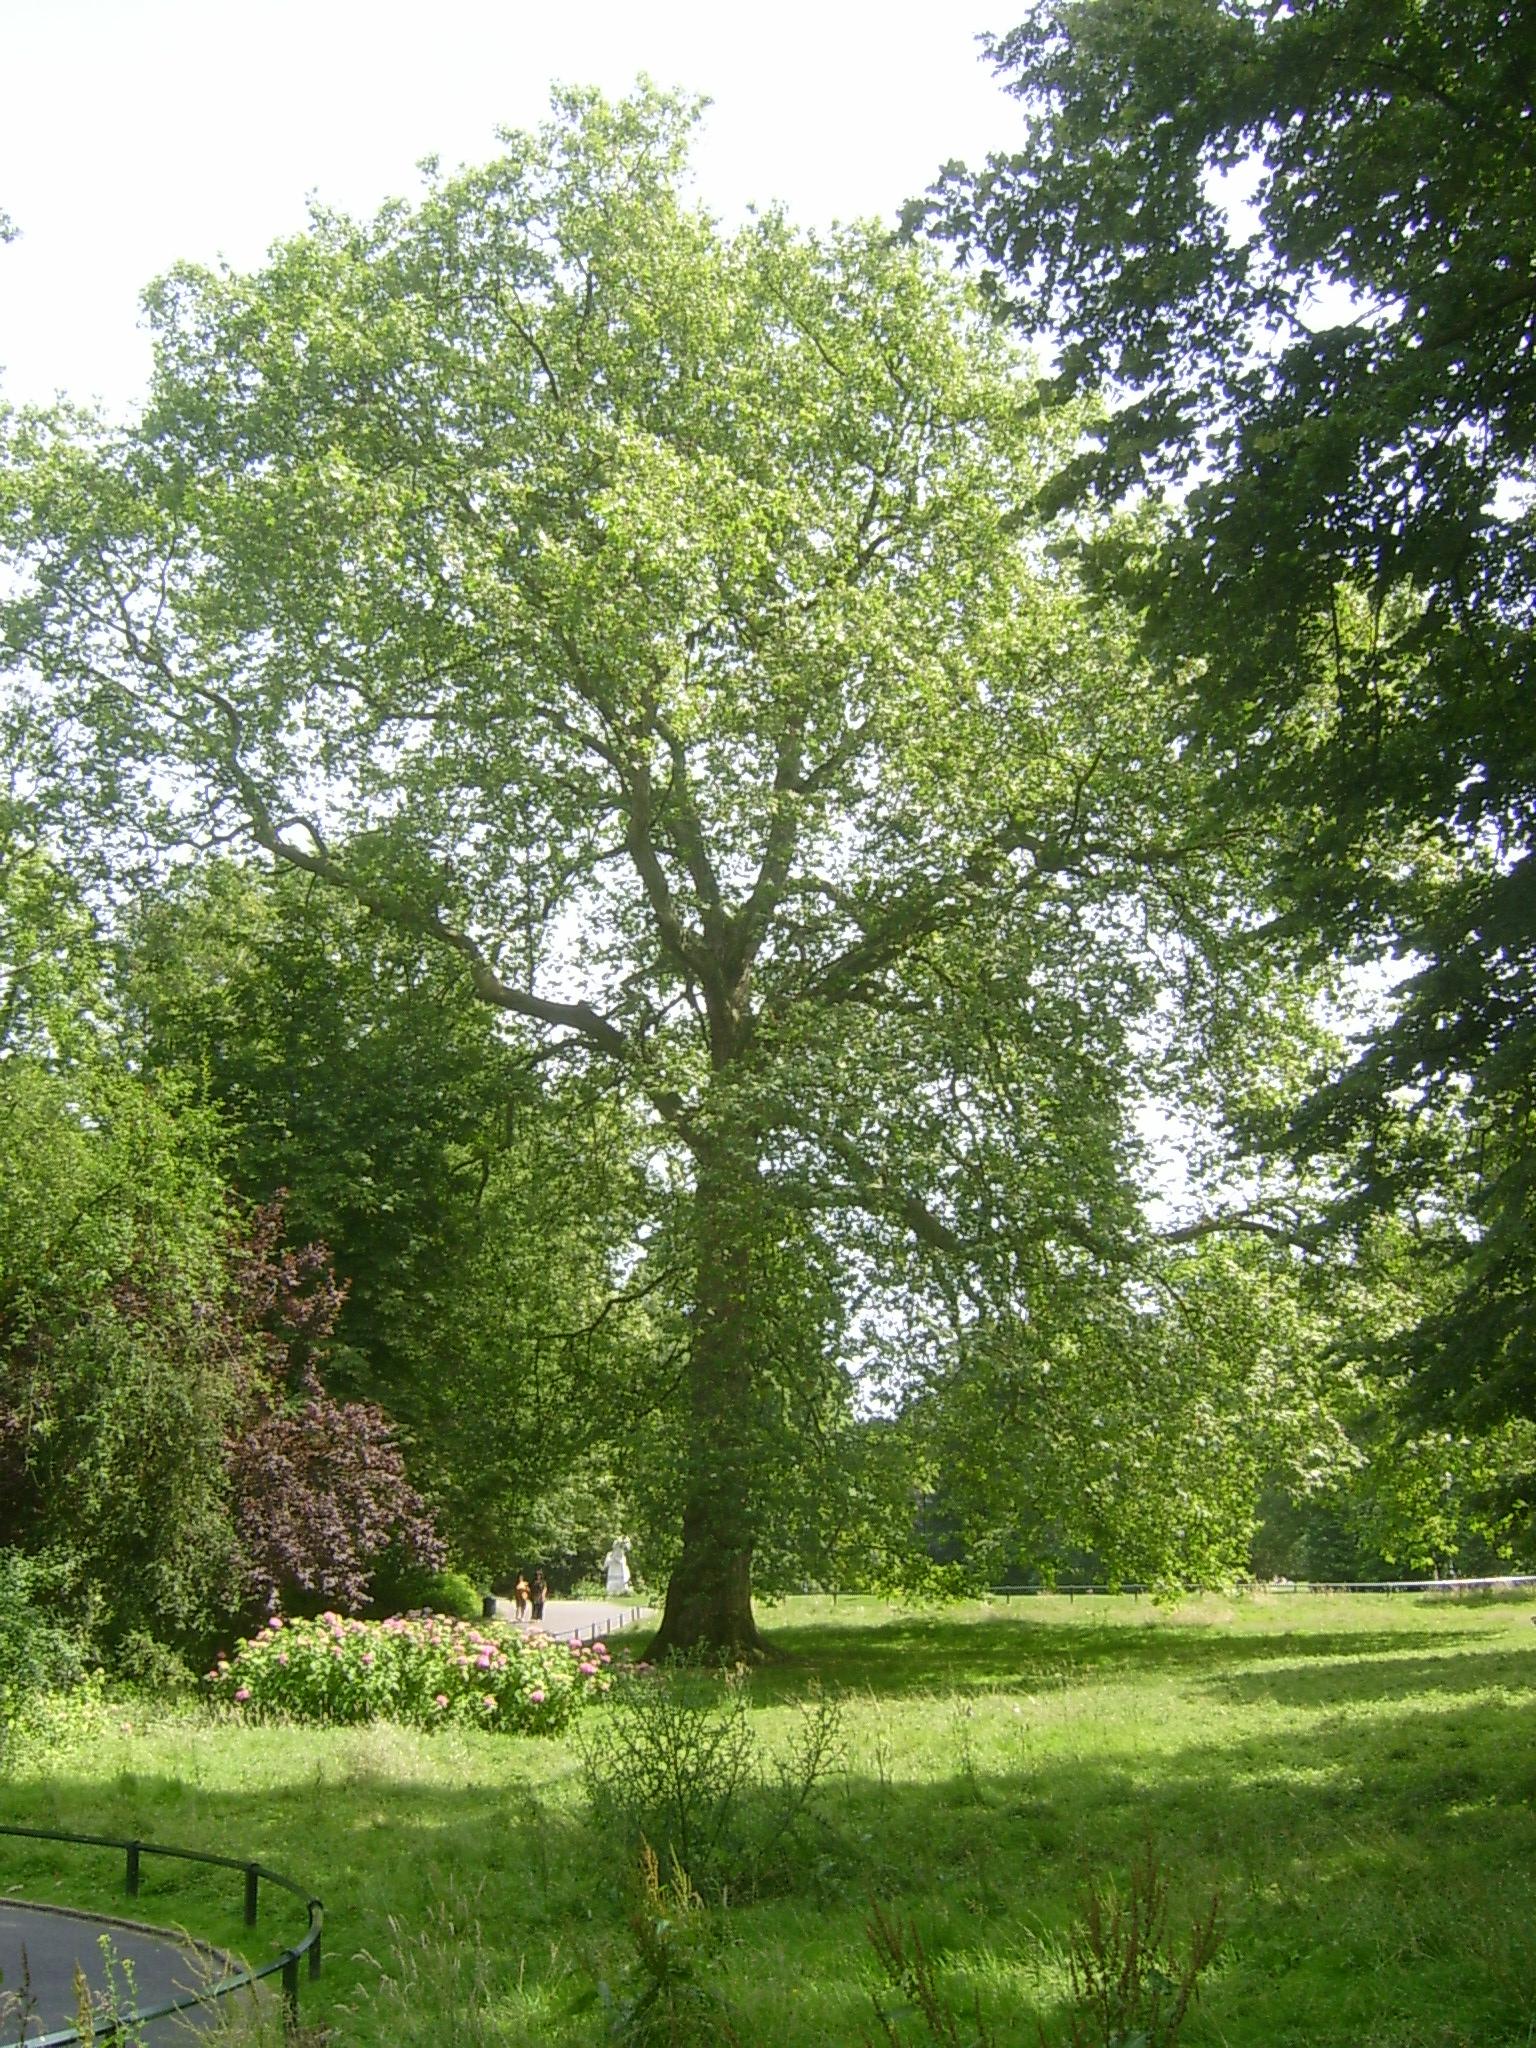 Platane à feuille d'érable – Schaerbeek, Parc Josaphat –  16 Juillet 2013